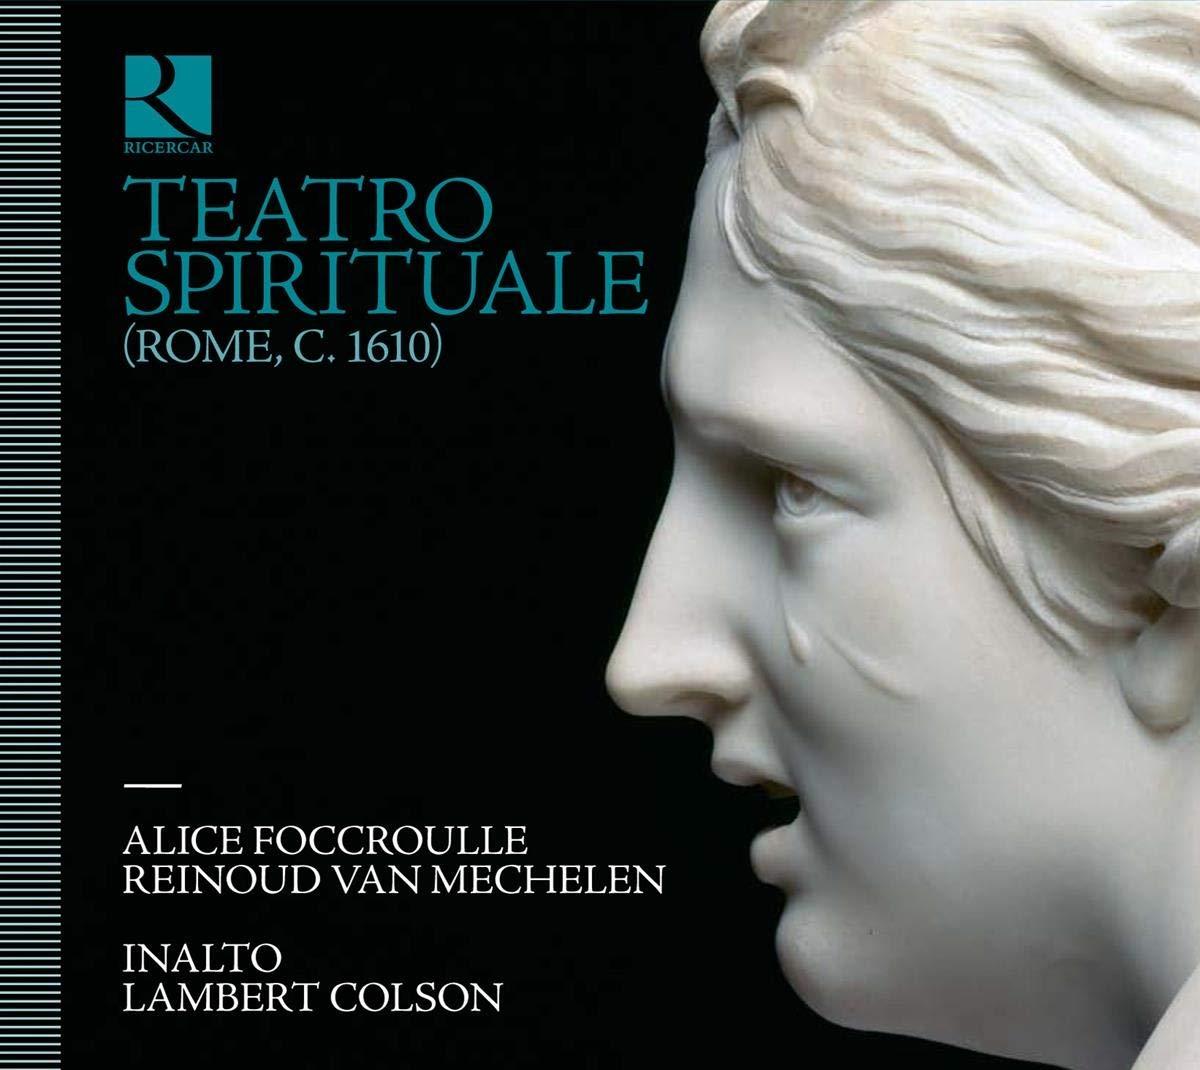 Teatro Spirituale Girolamo Frescobaldi Paolo Quagliati